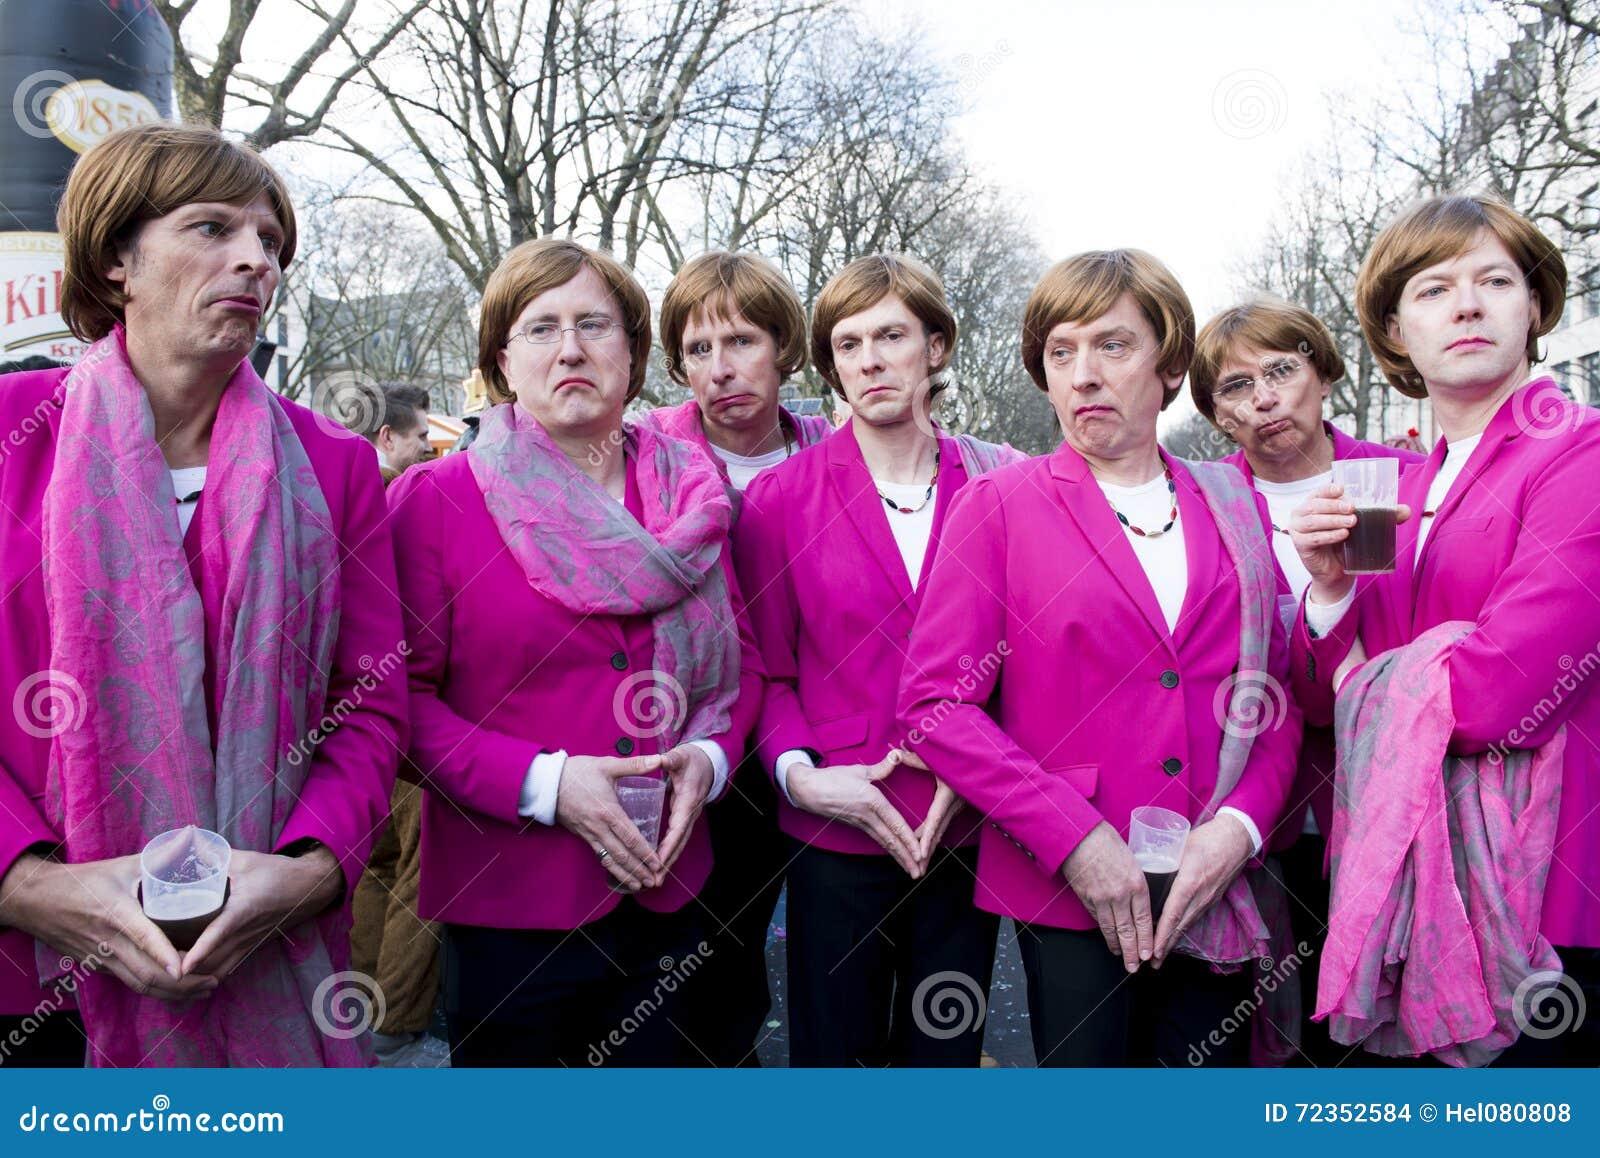 Groep jonge mensen die als Angela Merkel stellen